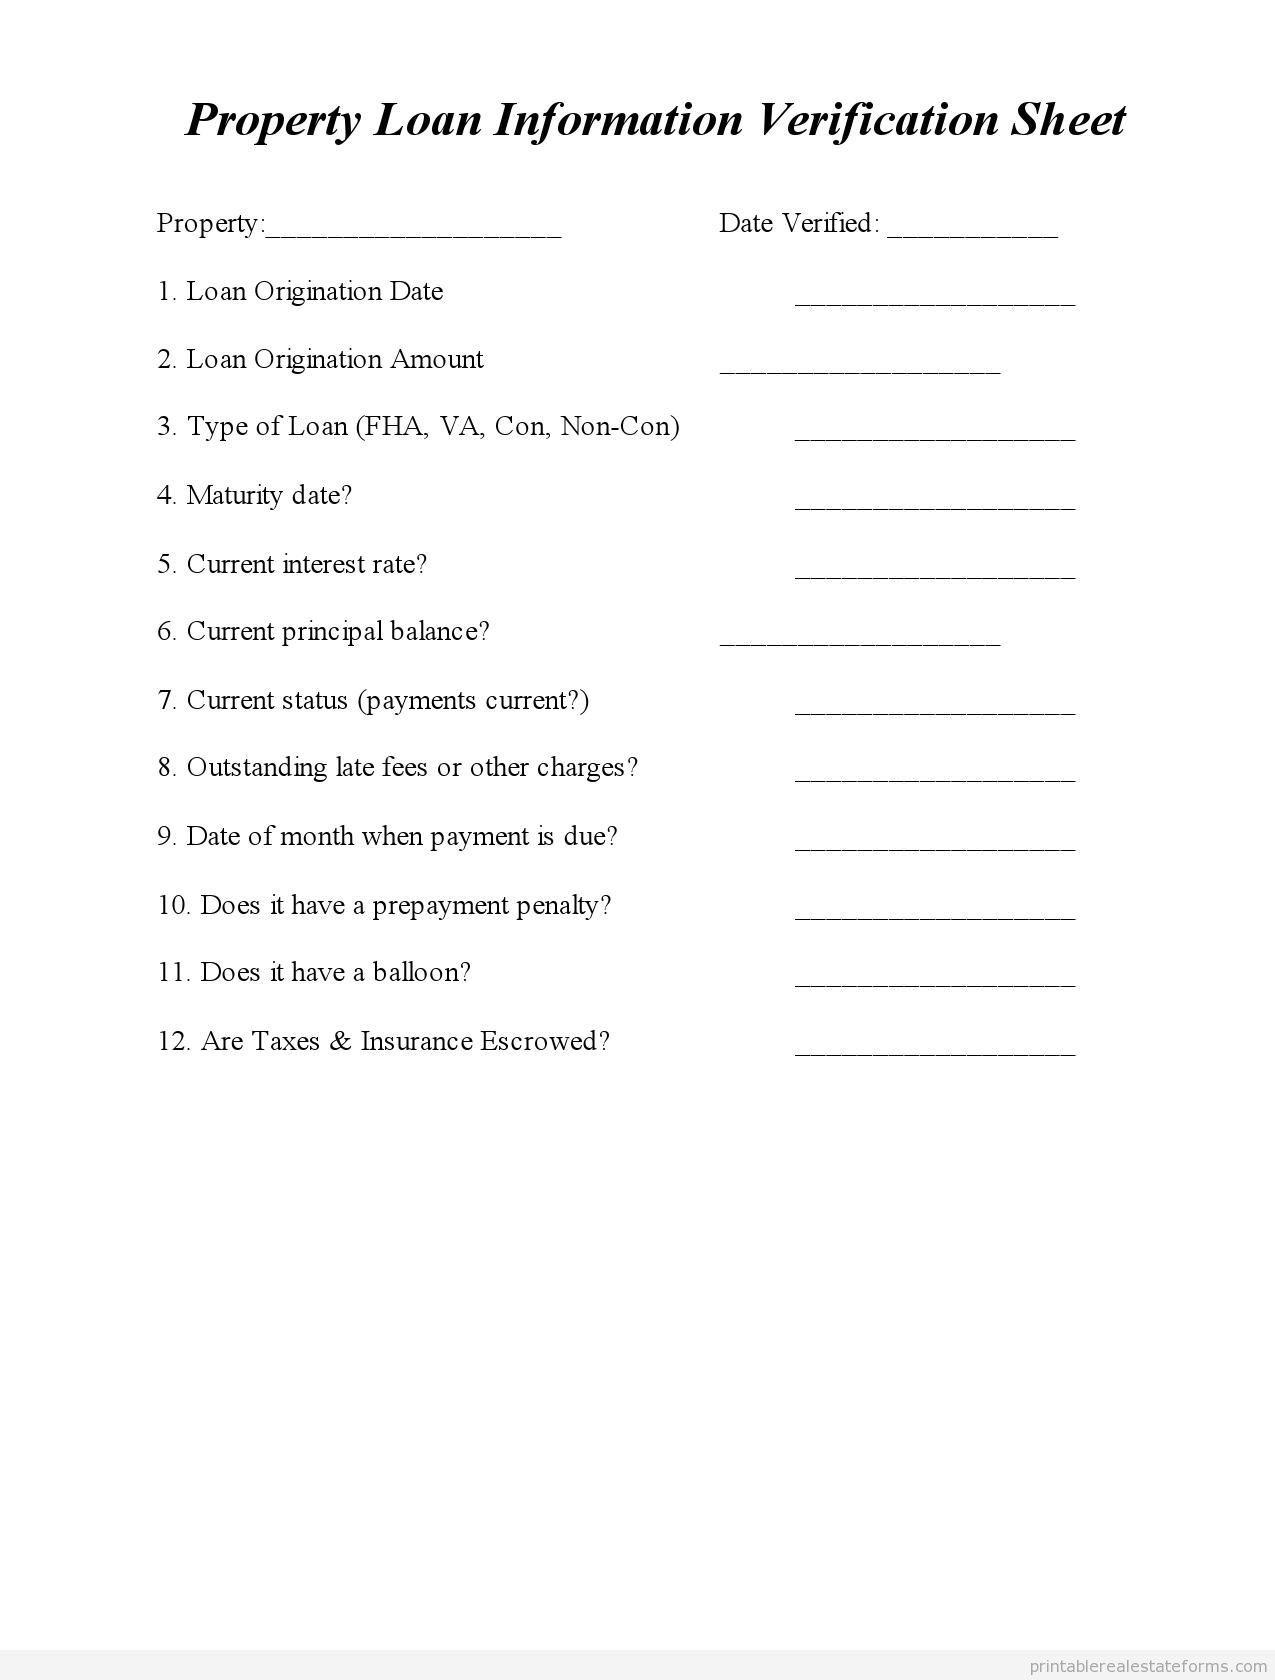 Printable property loan information verification sheet template – Sample Rate Sheet